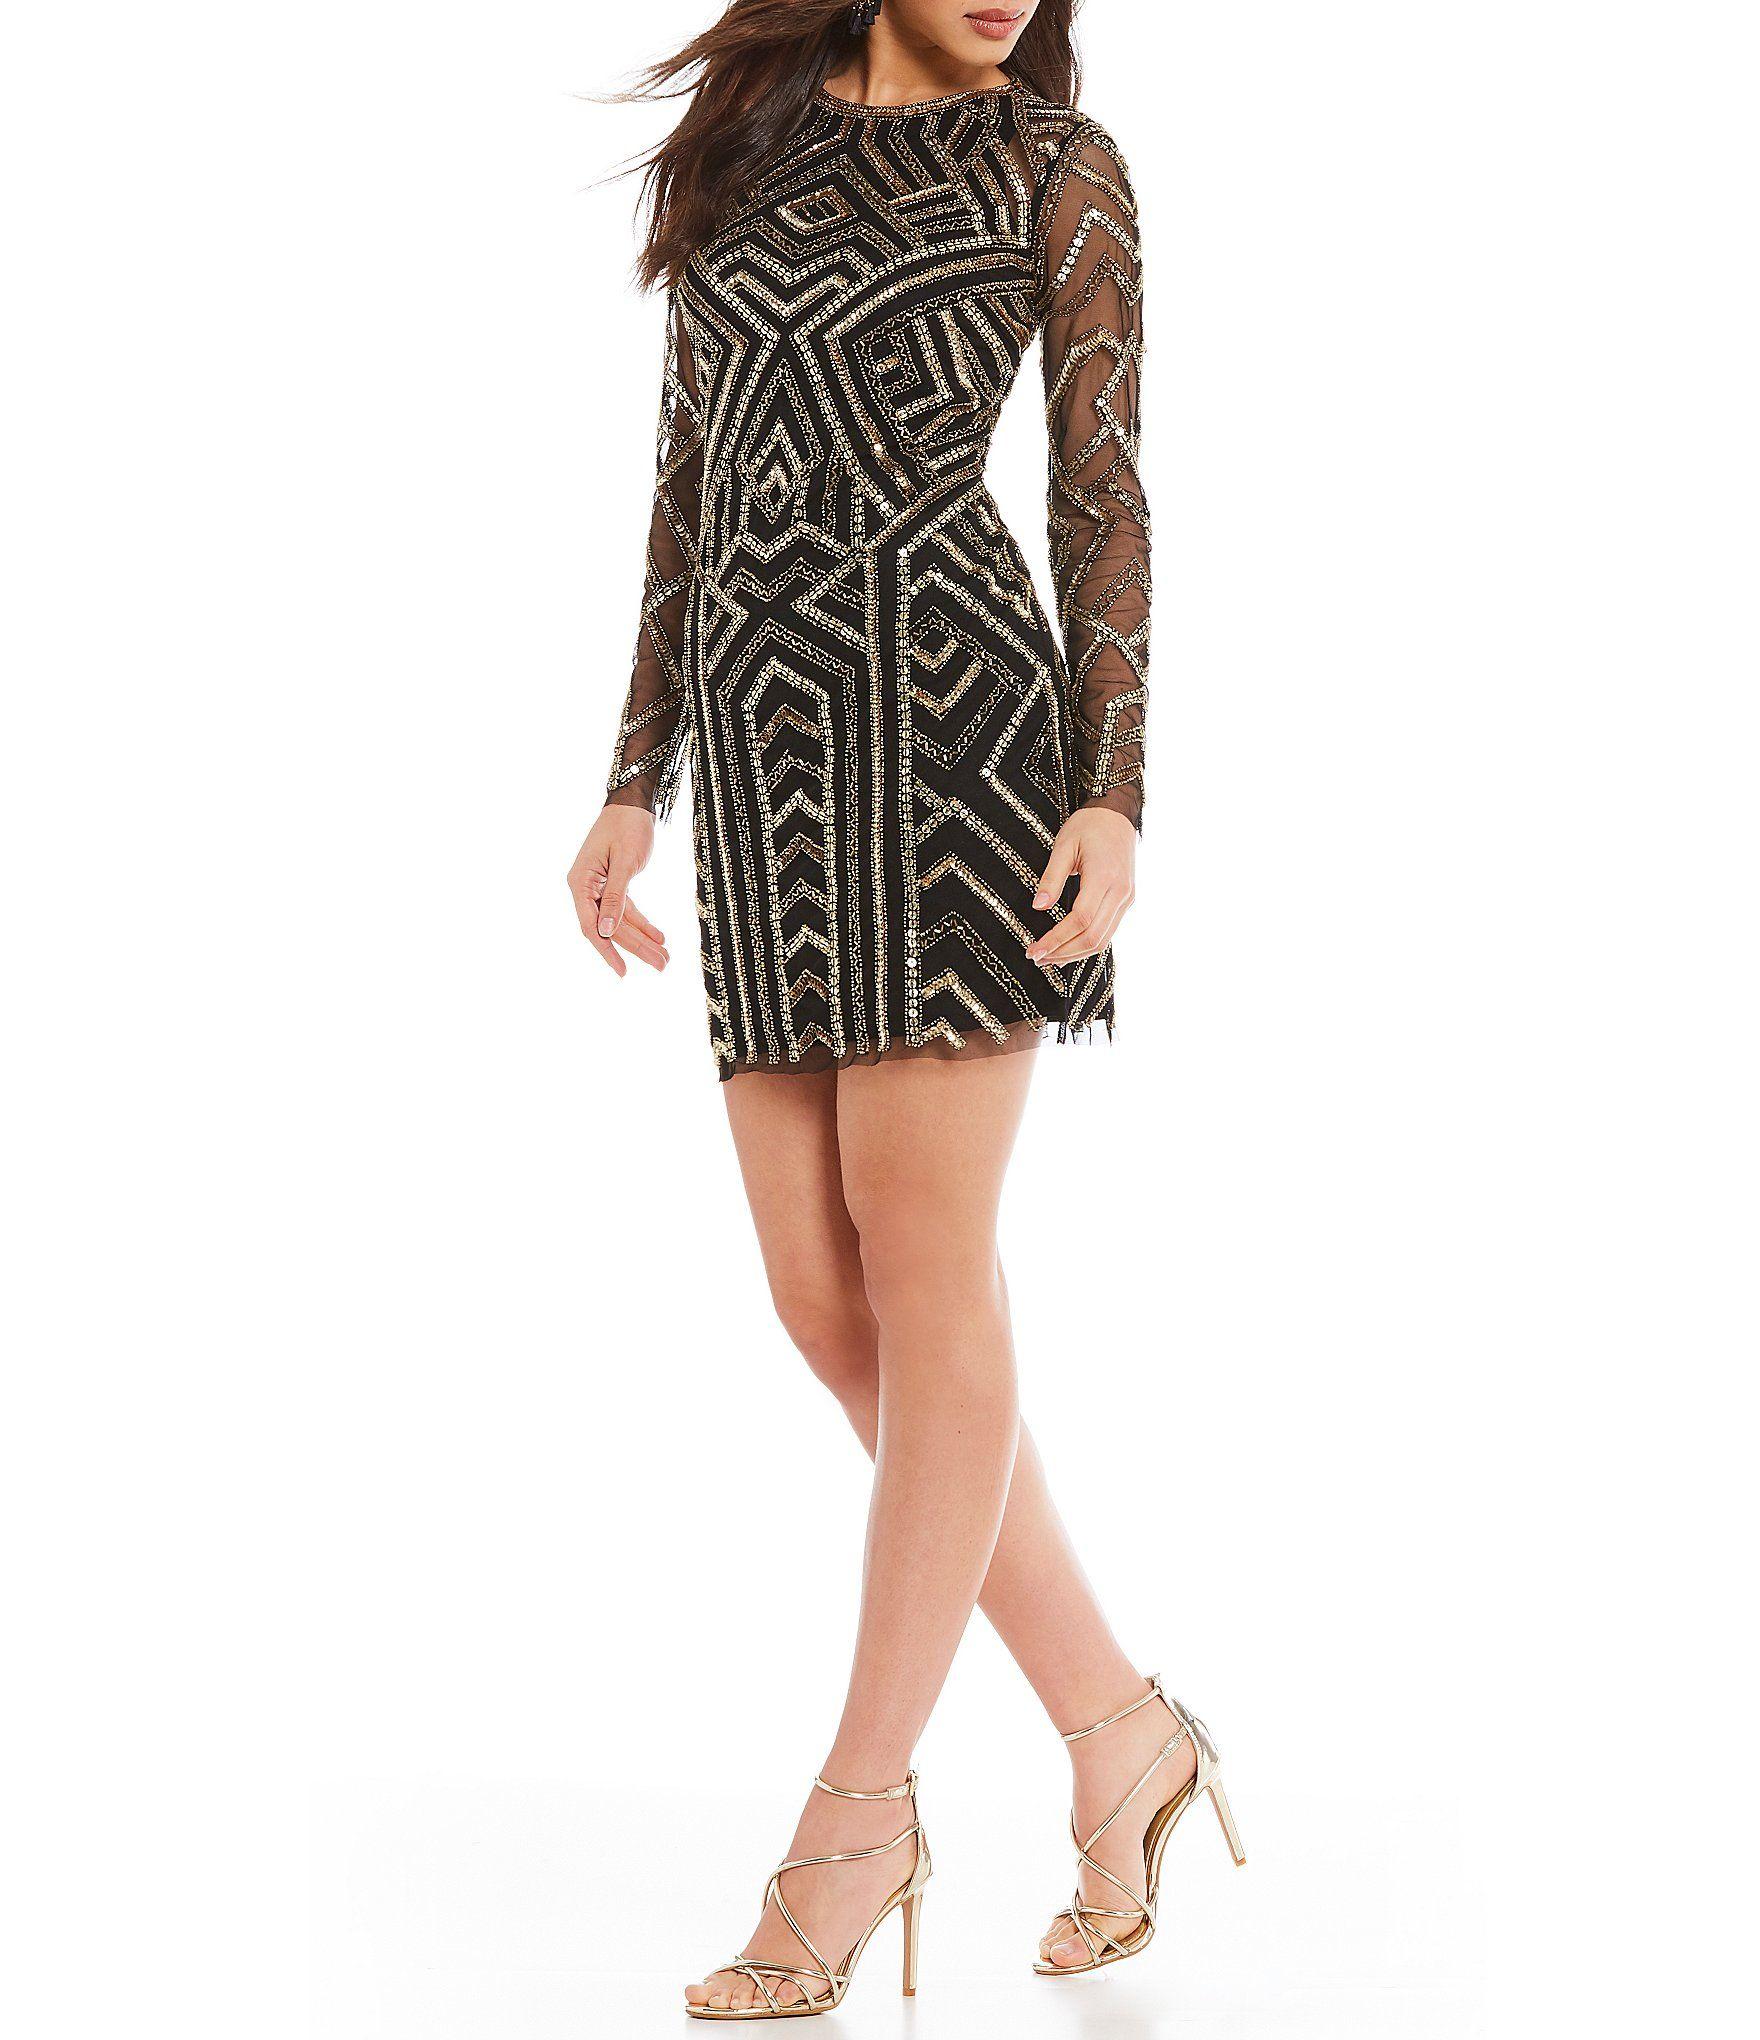 8ed5a13031c Shop for Gianni Bini Kim Geometric Sequin Dress at Dillards.com. Visit  Dillards.com to find clothing